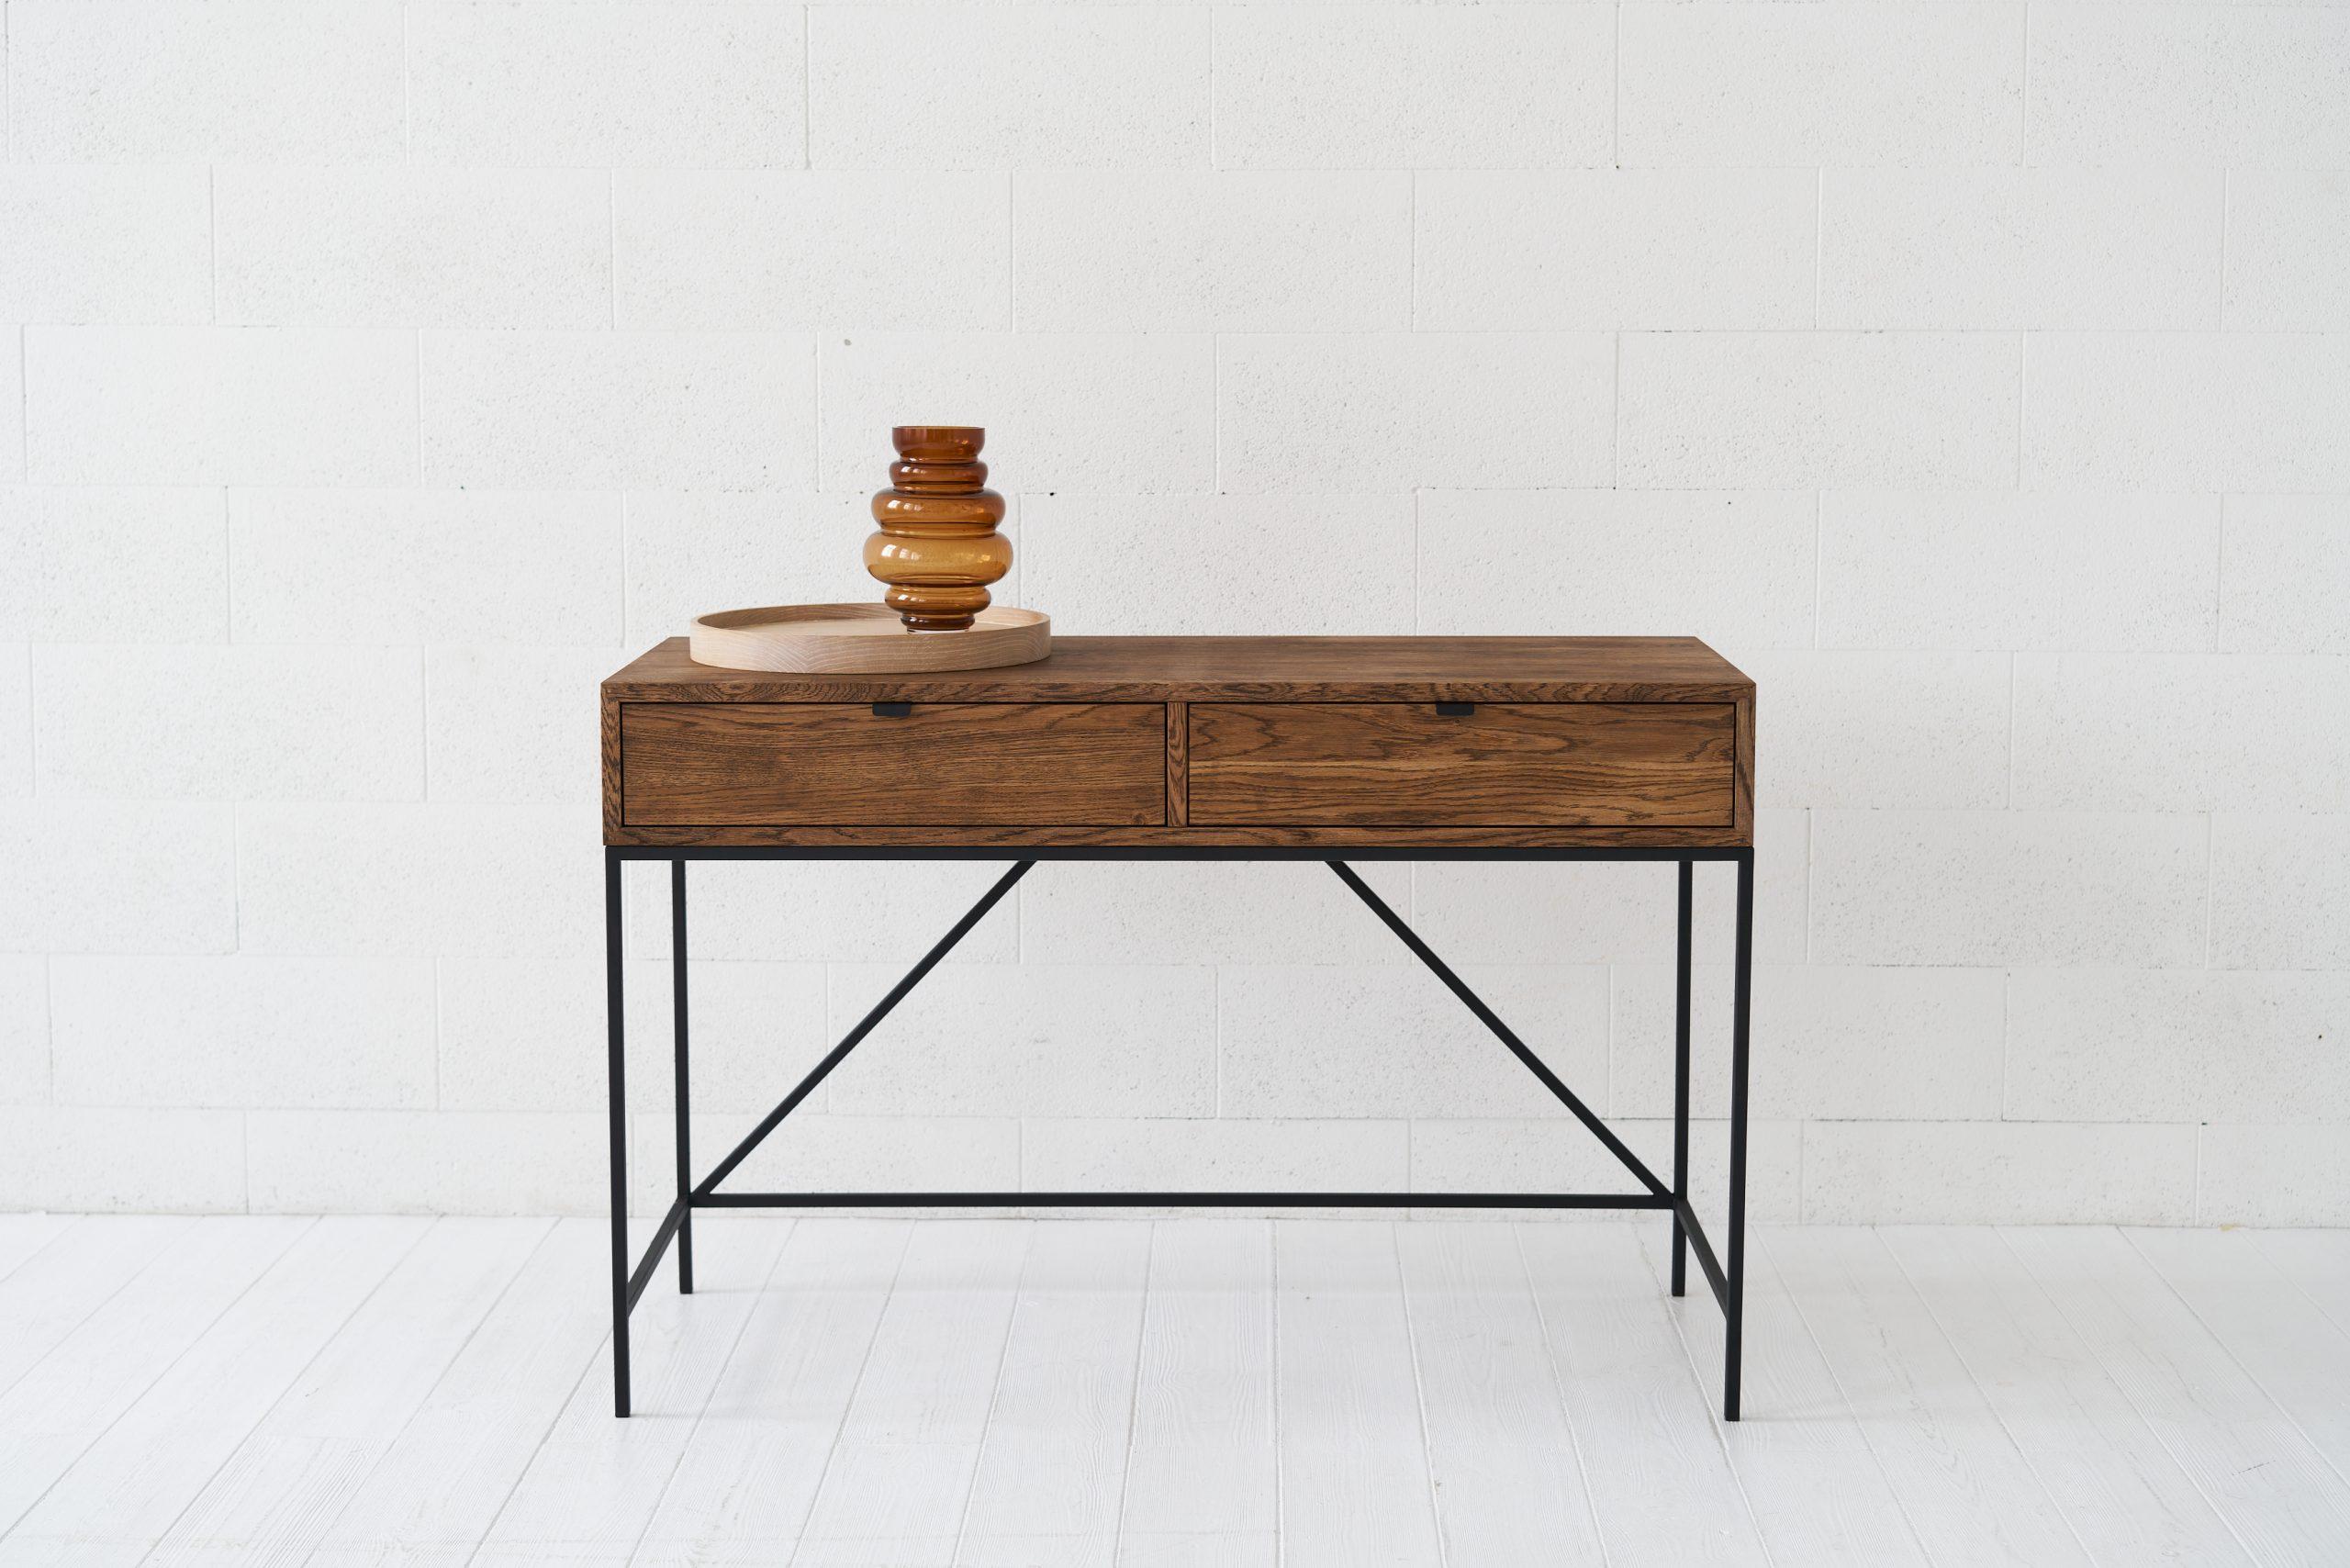 SCRIPT darbo stalas